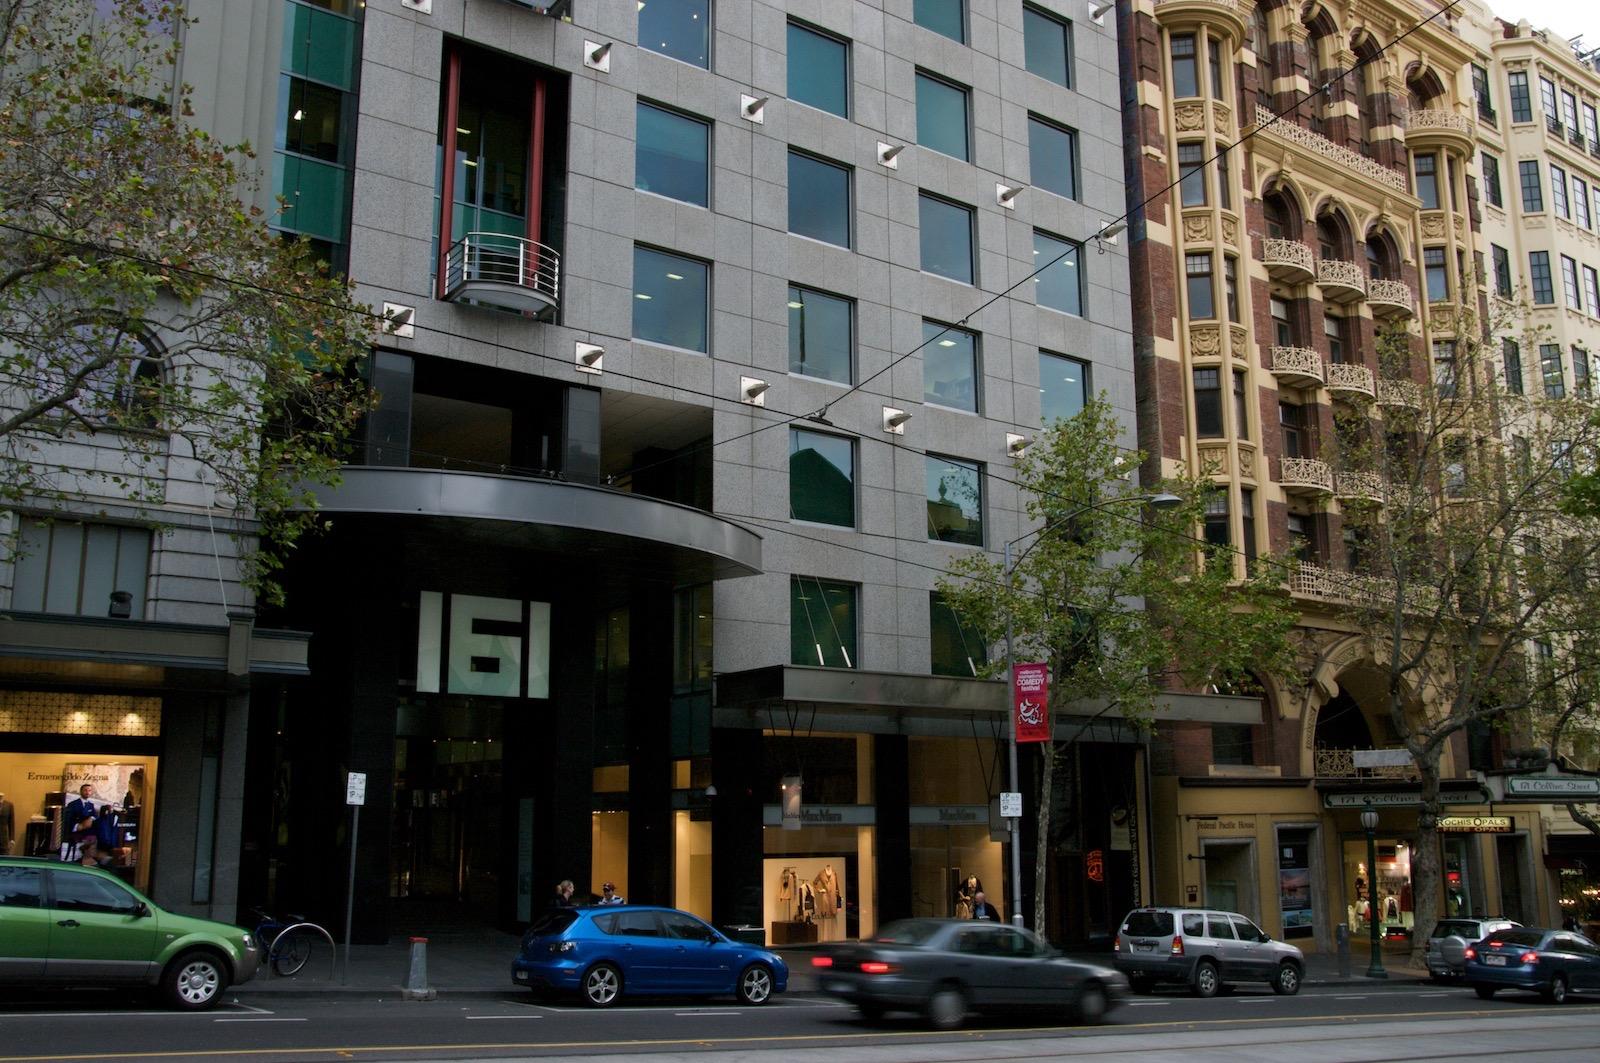 Melbourne stuff - 1 of 223 (3).jpg